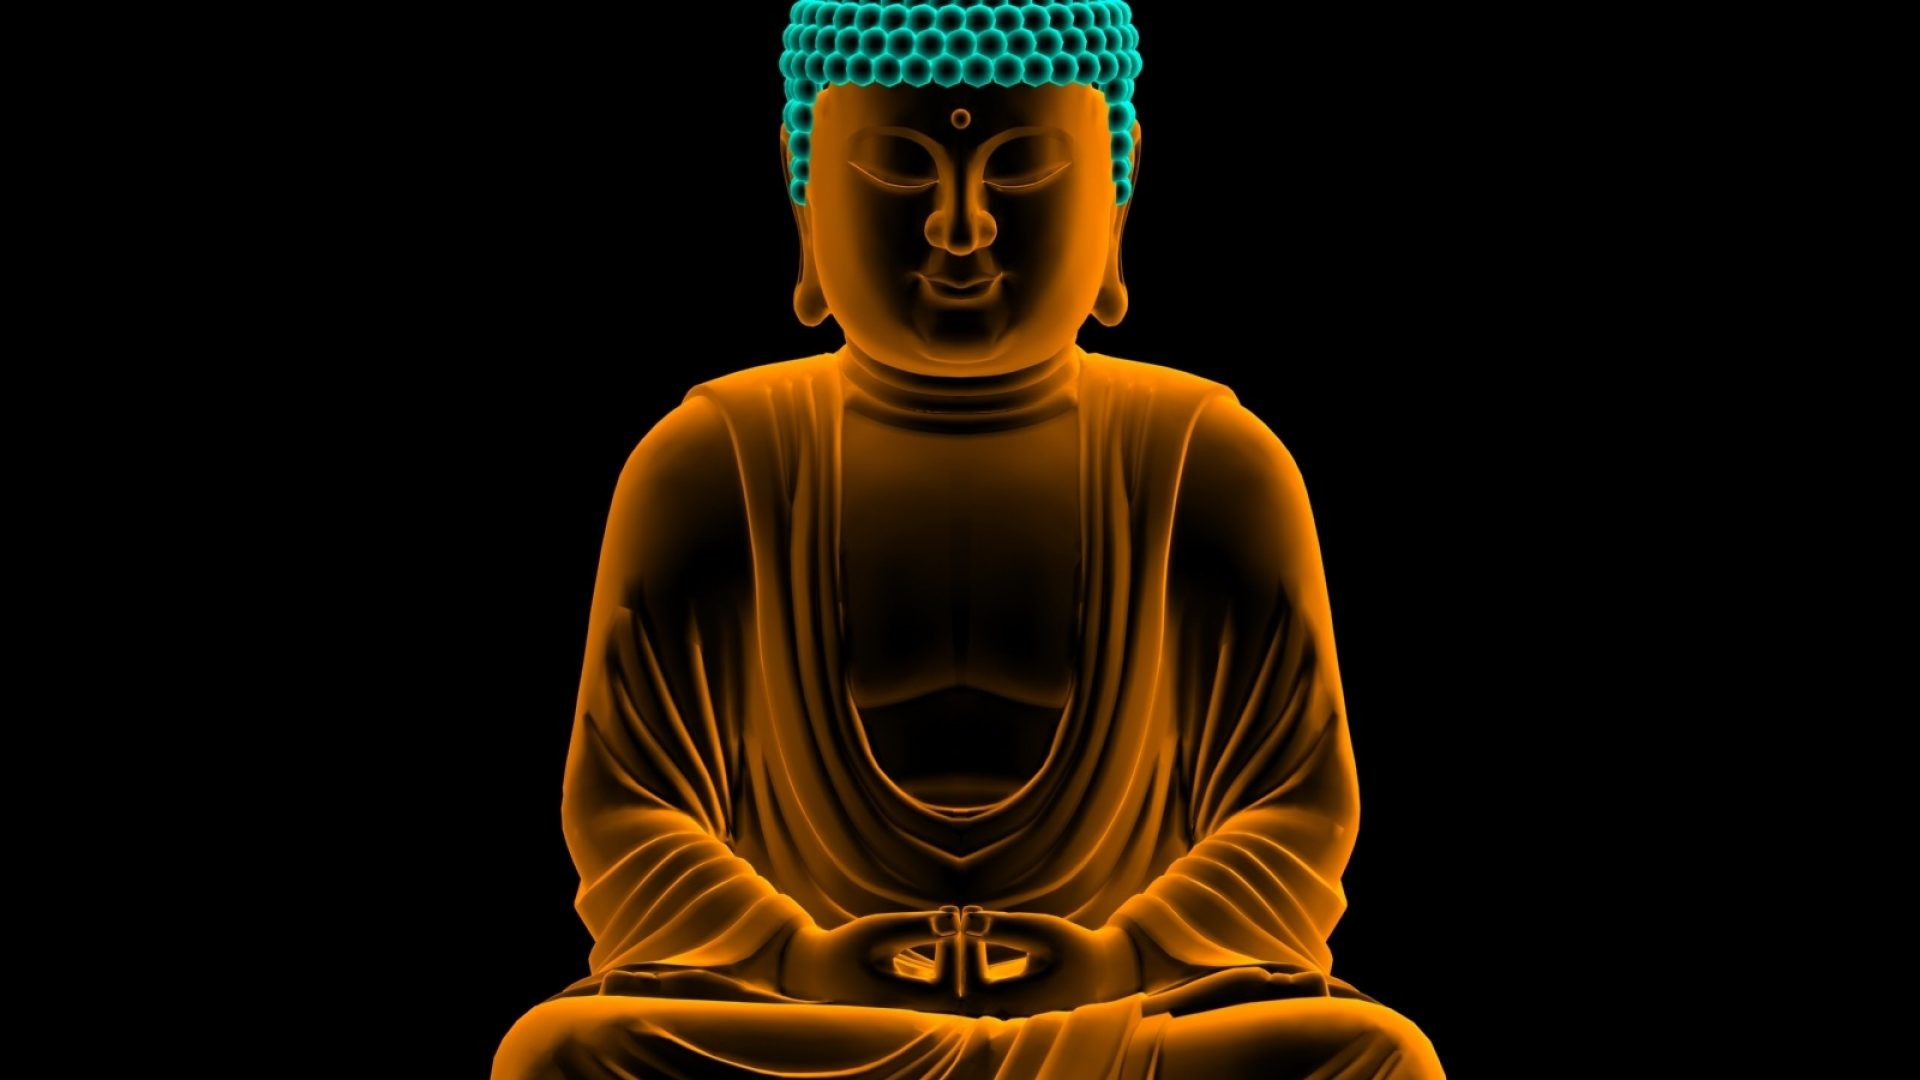 Pinterest Desktop Wallpaper Lotus Quote Buddha Wallpaper 1920x1080 79 Images